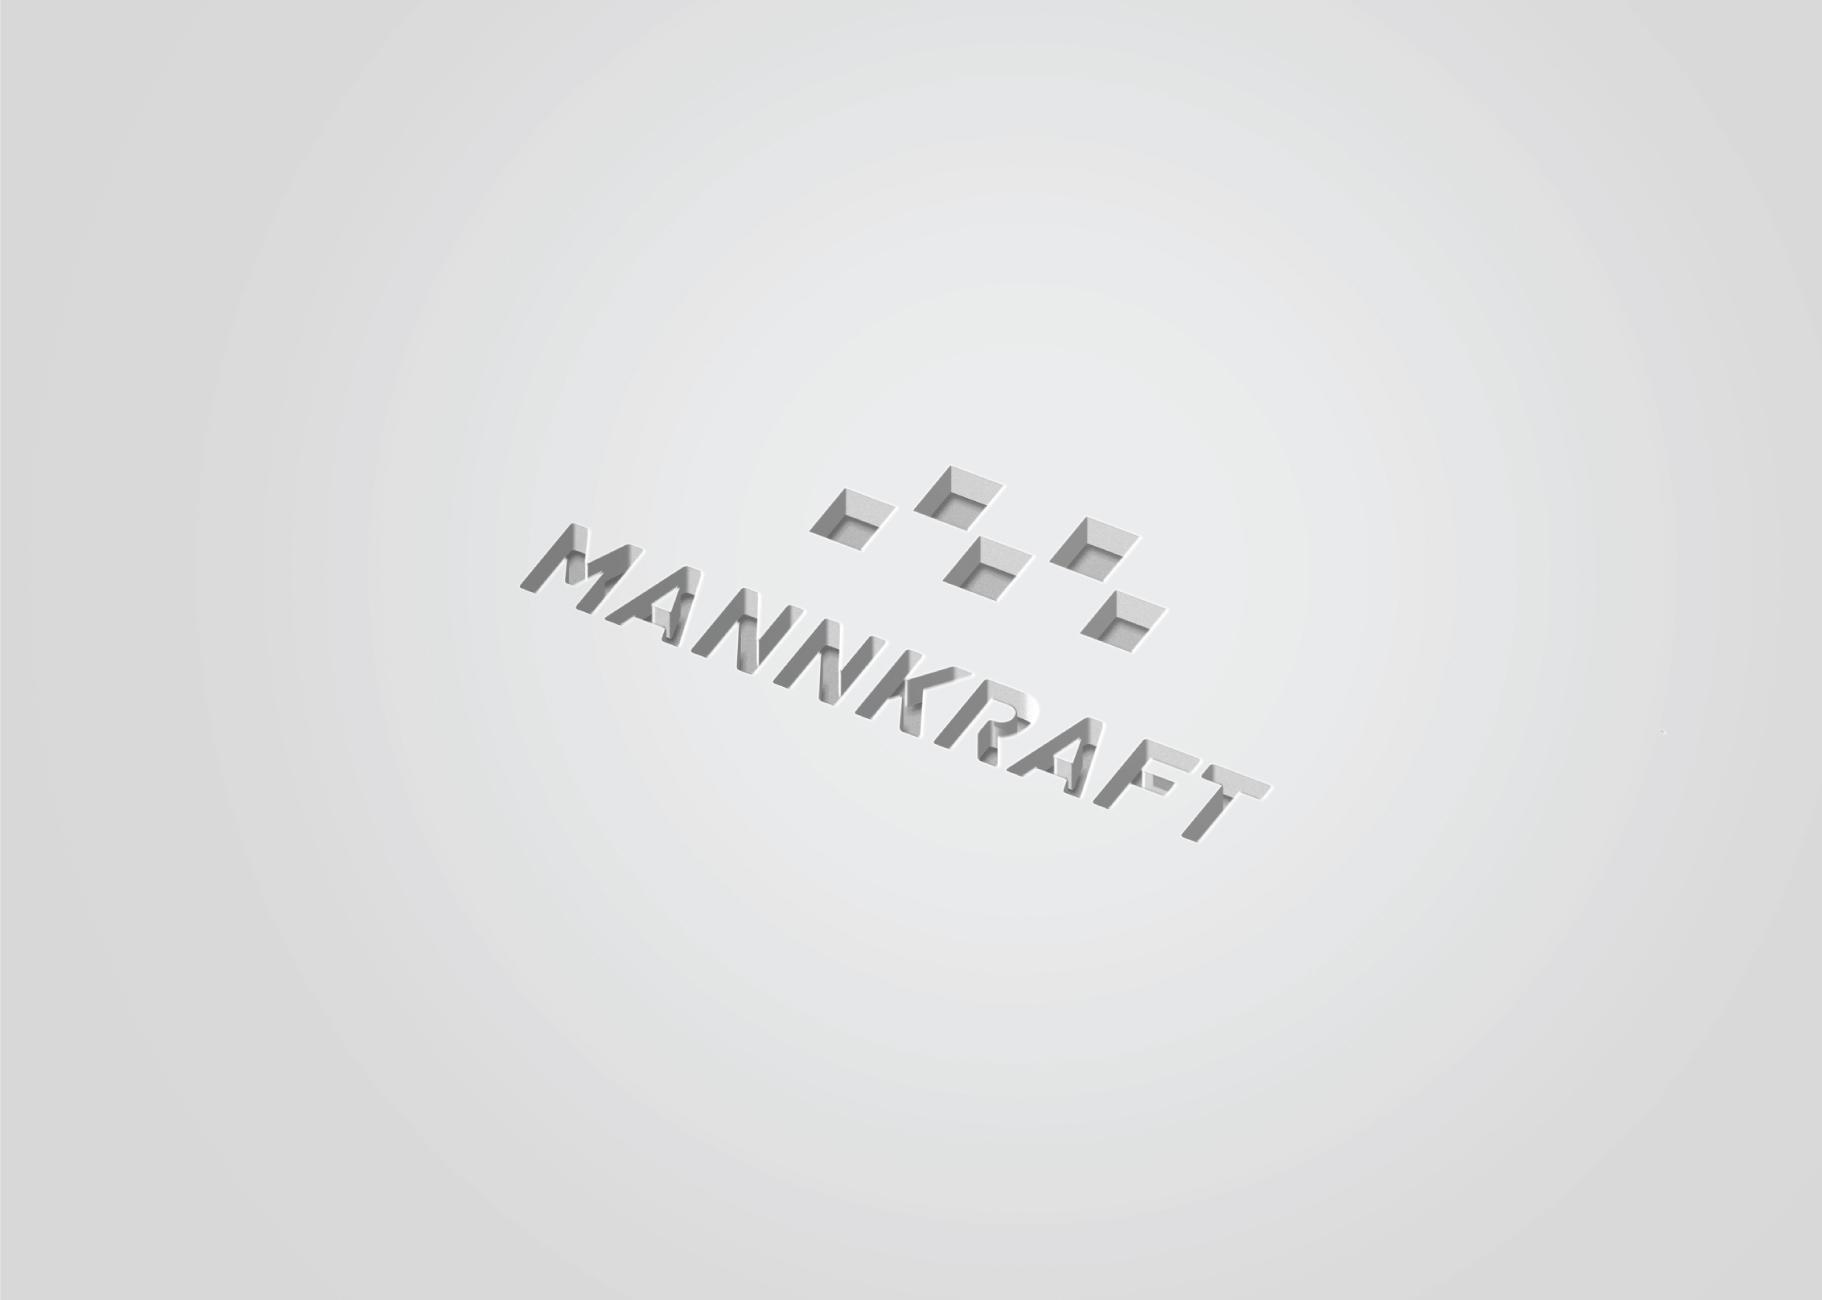 Mannkraft, nuevo logo diseñado por CHAN!